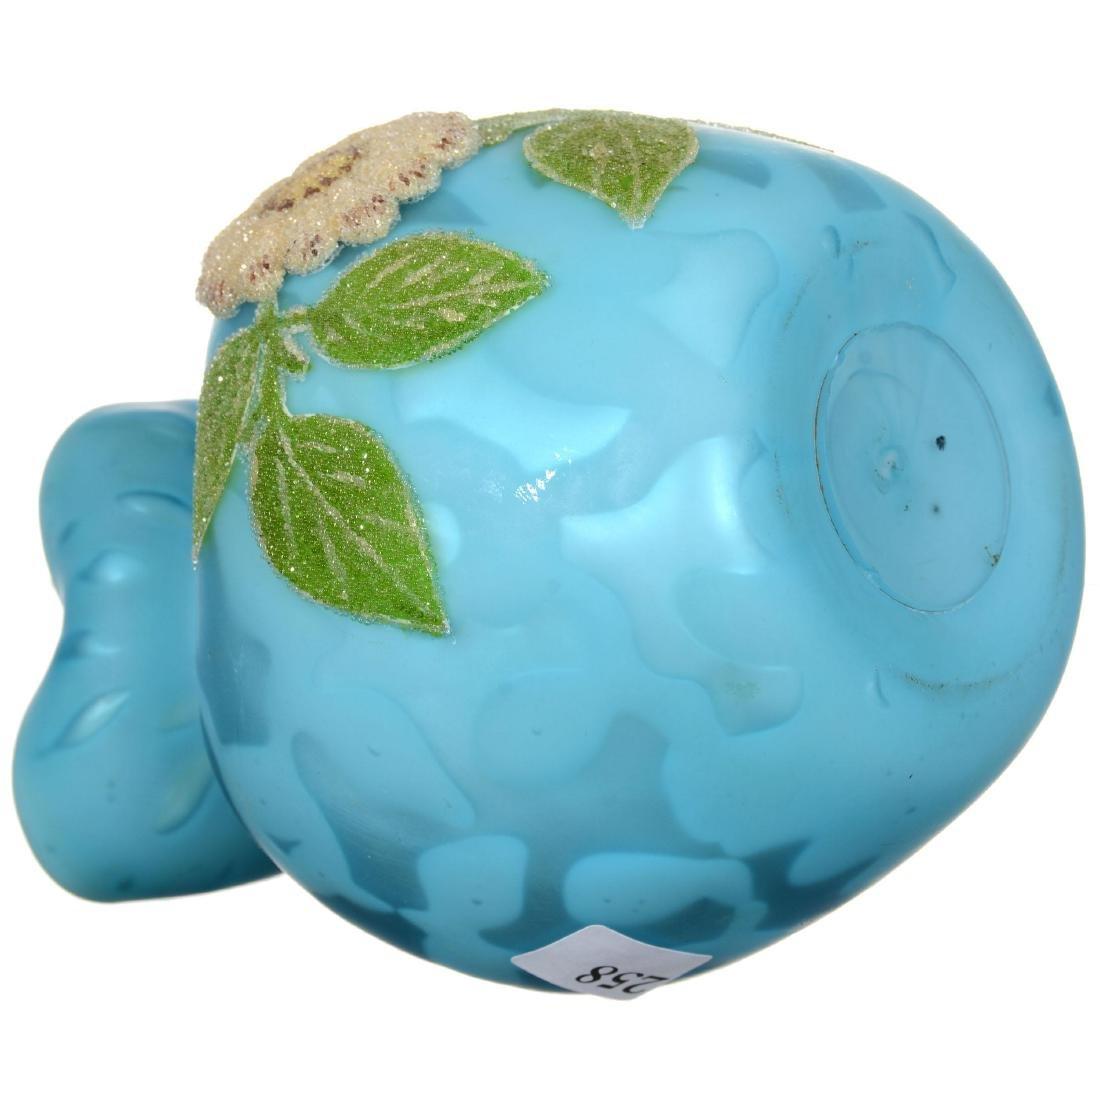 Blue Satin Mother of Pearl Art Glass Vase - 3